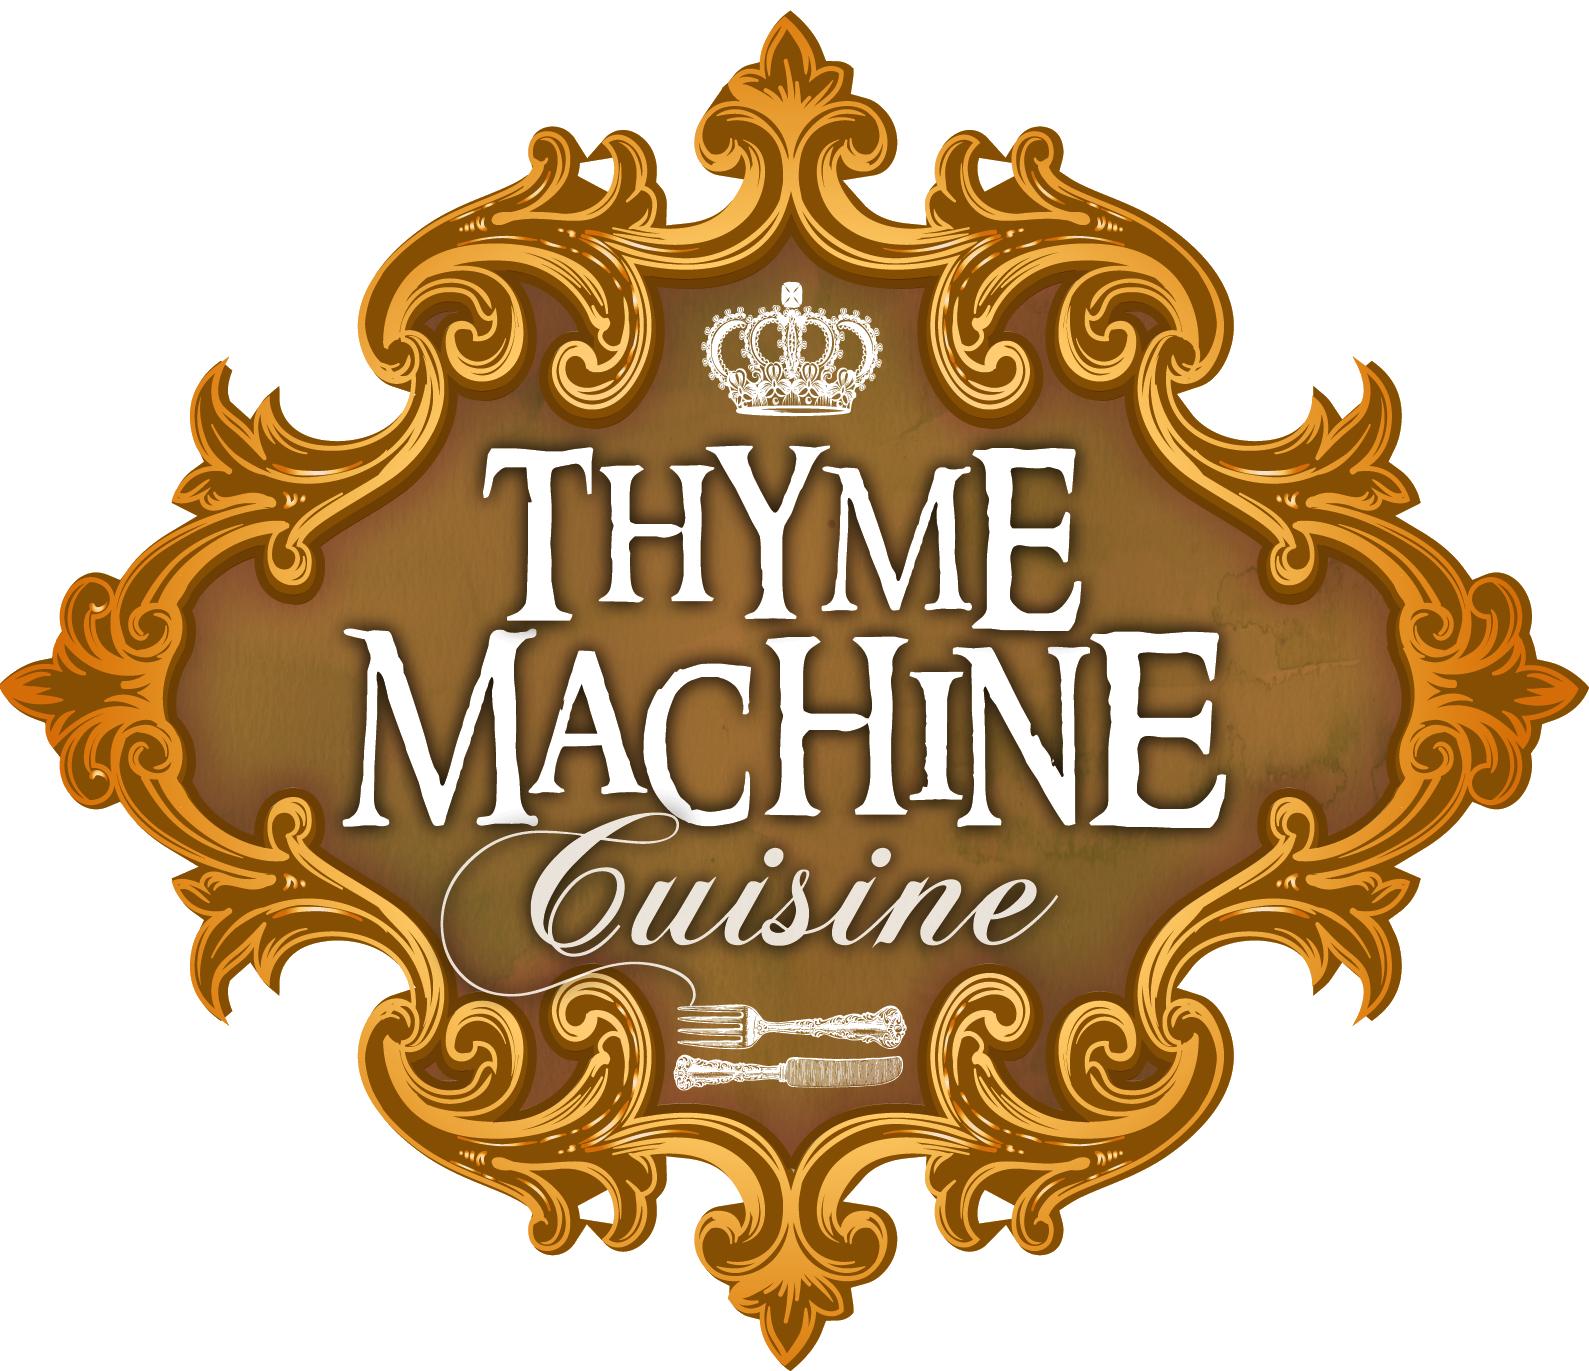 Thyme machine cuisine biocorpaavc Images